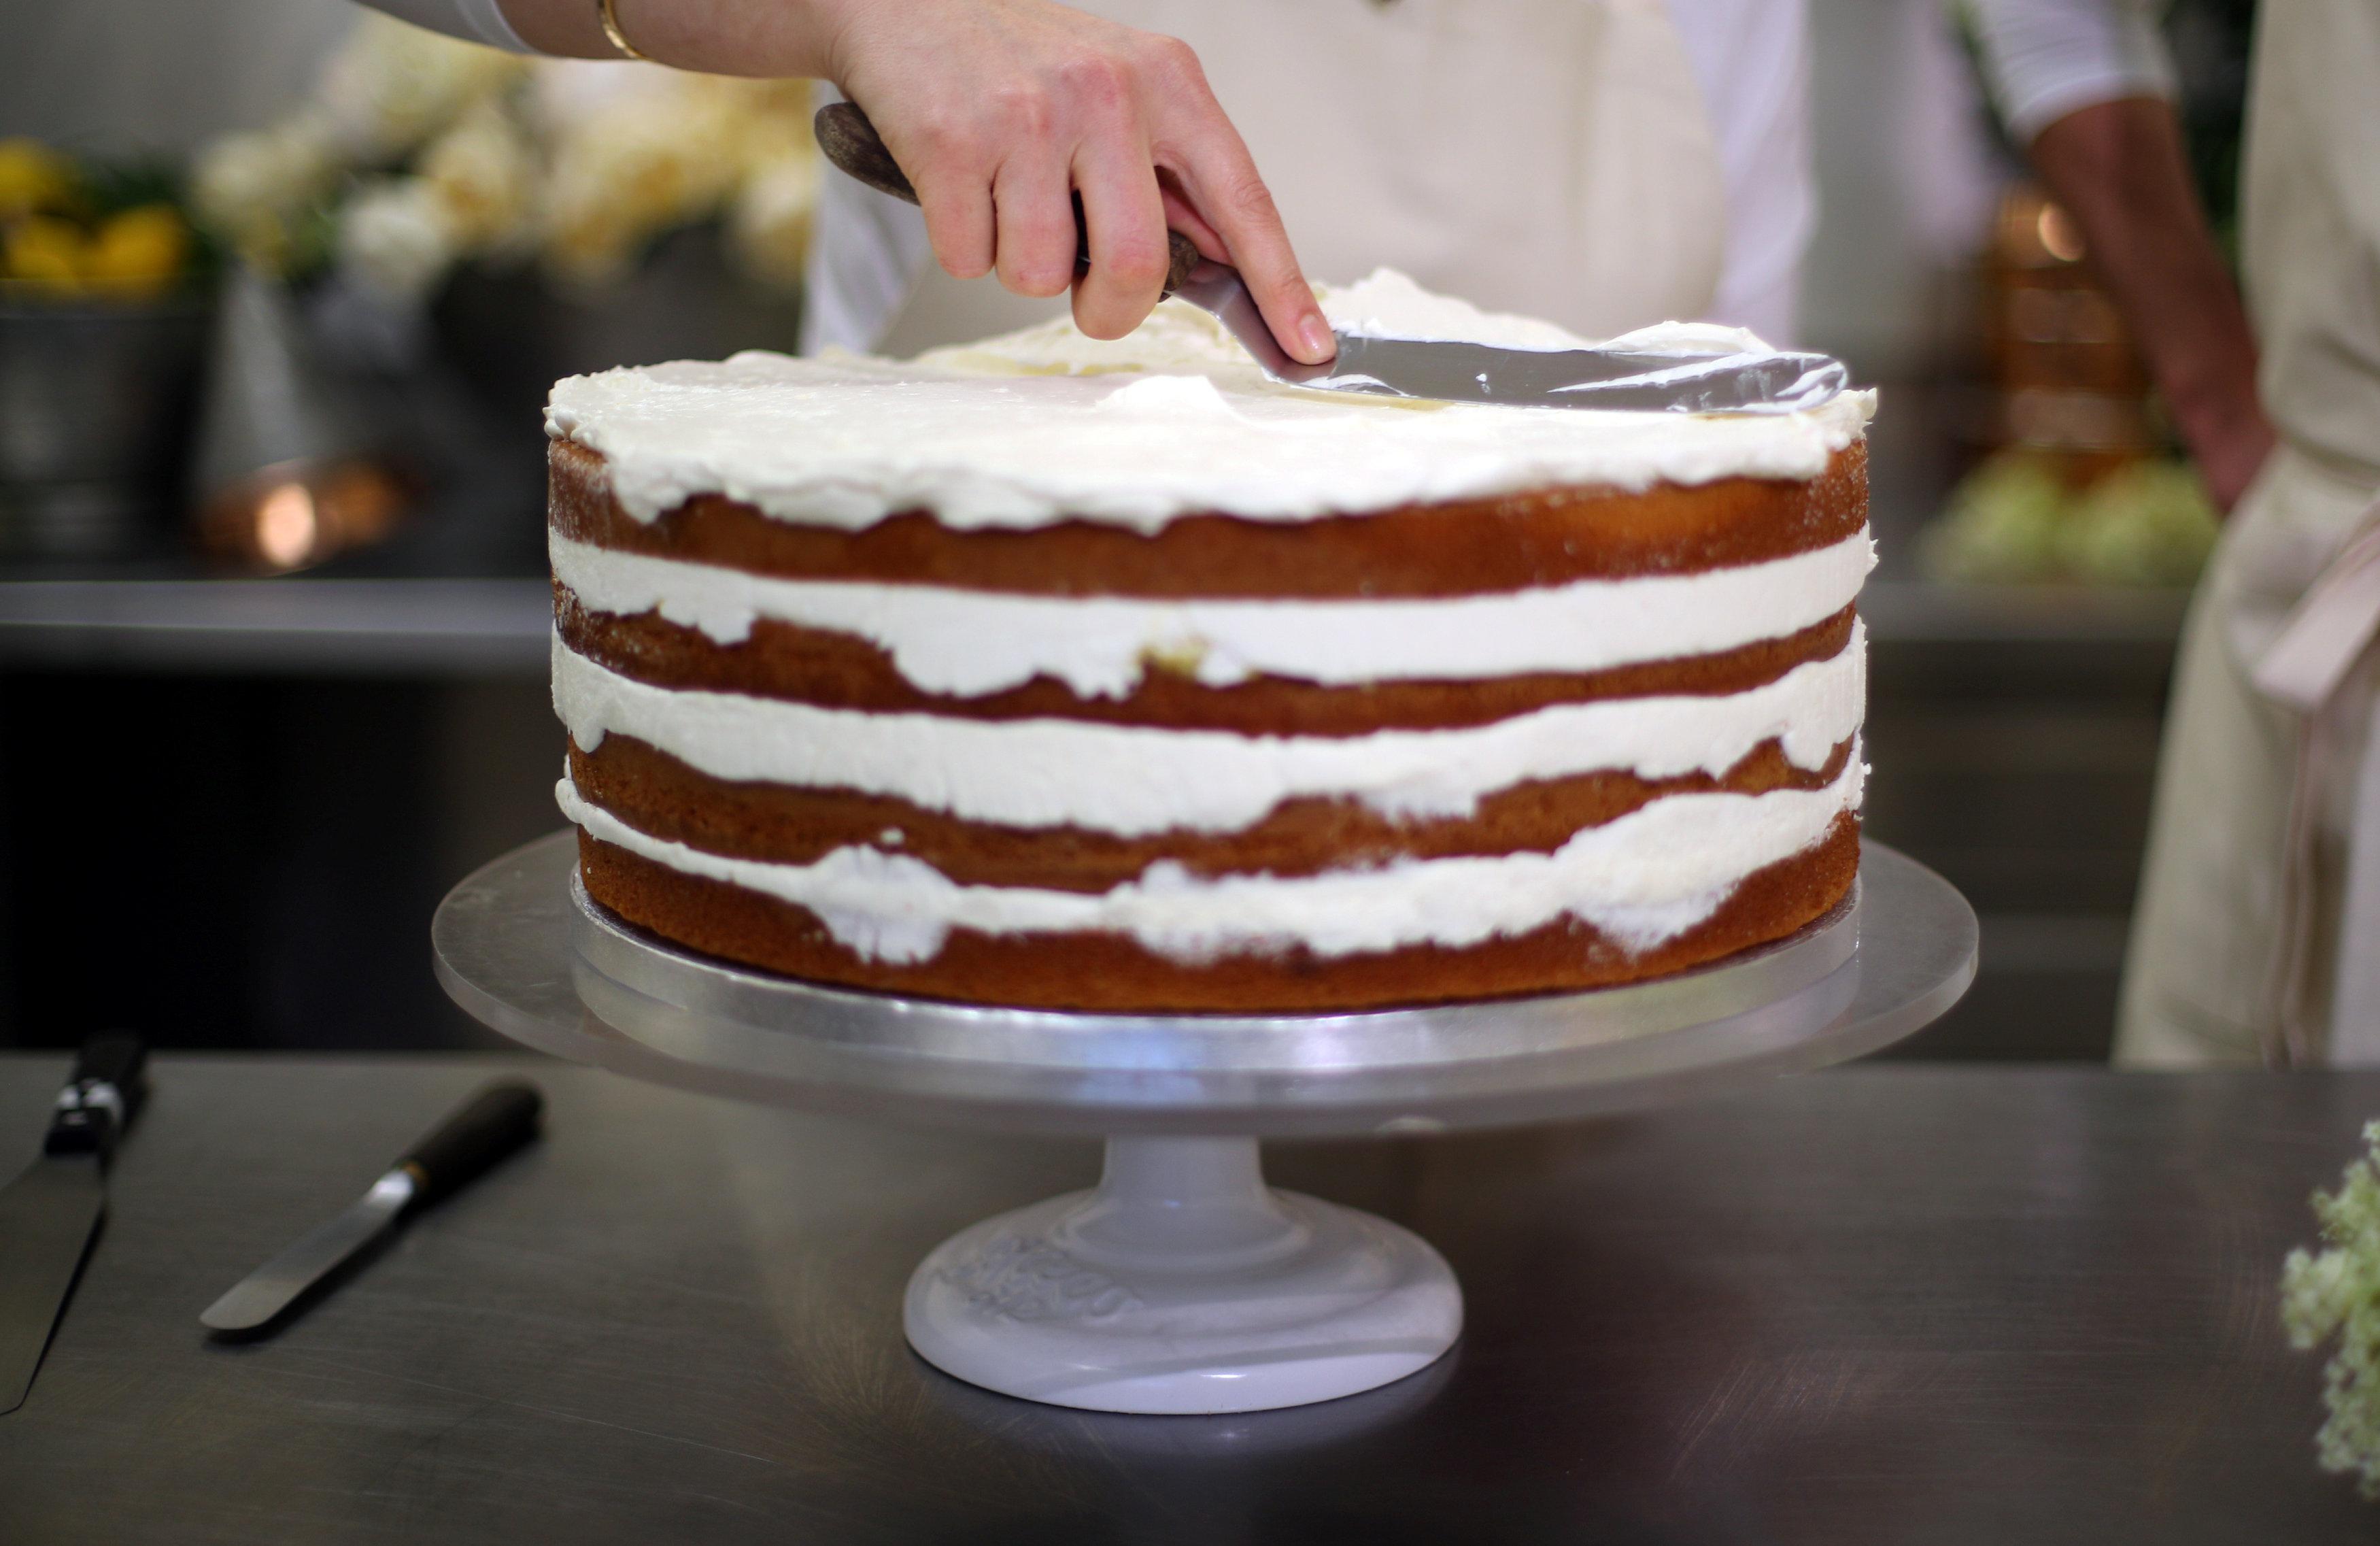 Ms. Meghan Markle's Wedding Cake